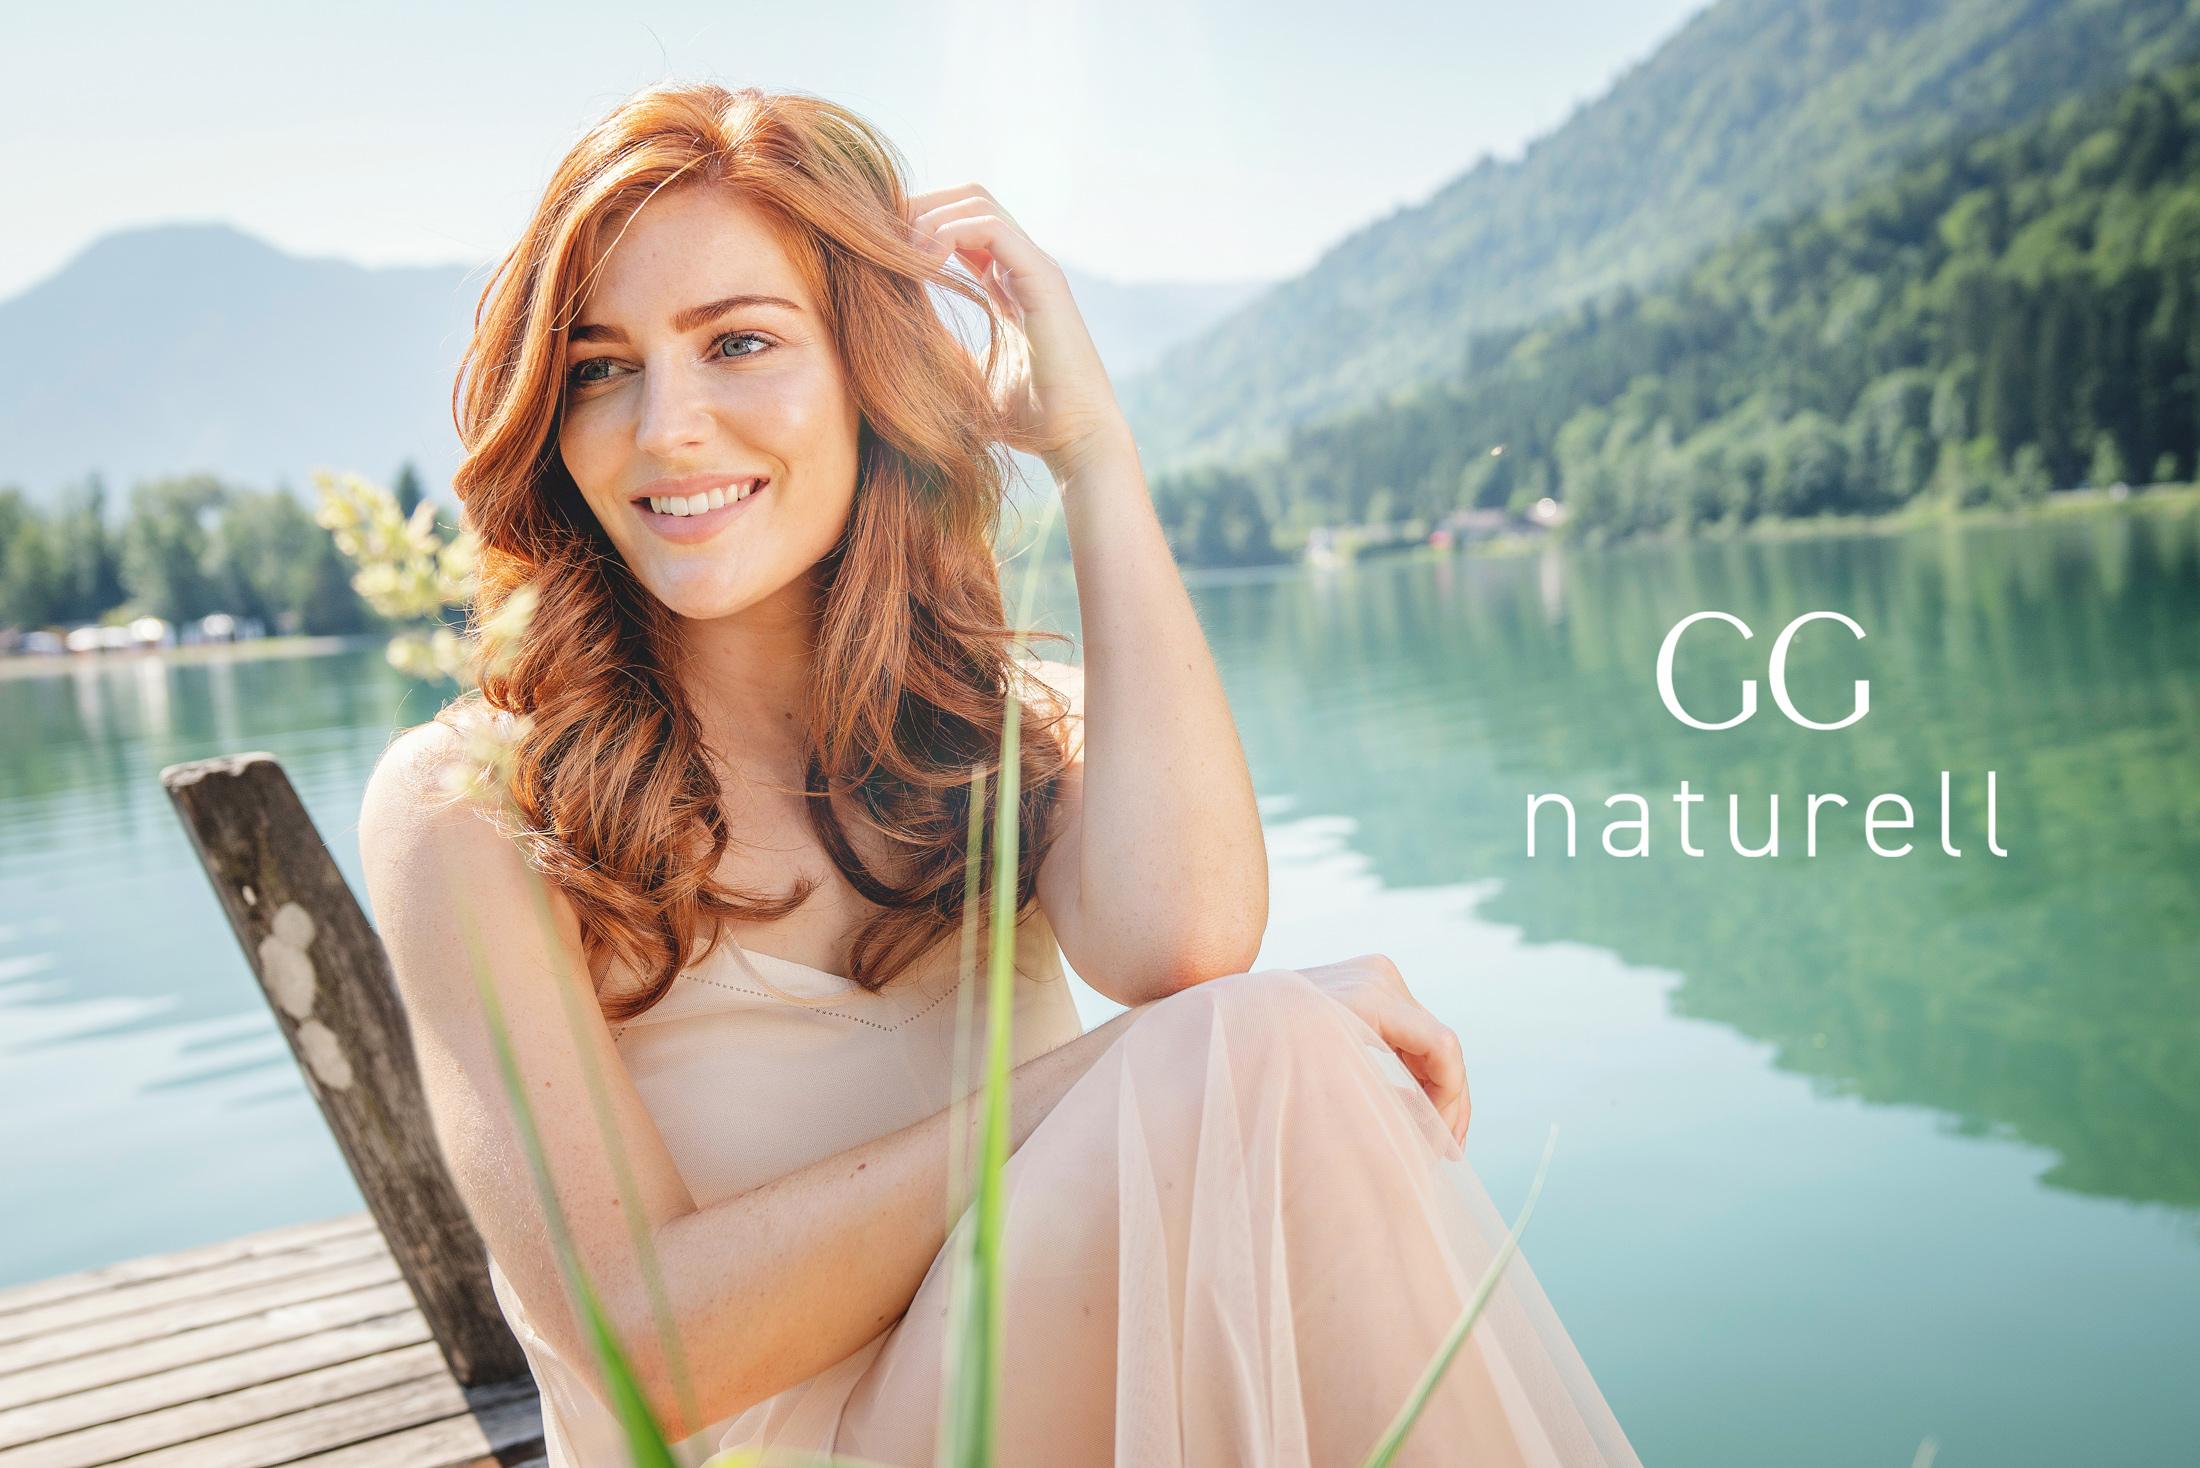 1-GG-Naturell(titel)